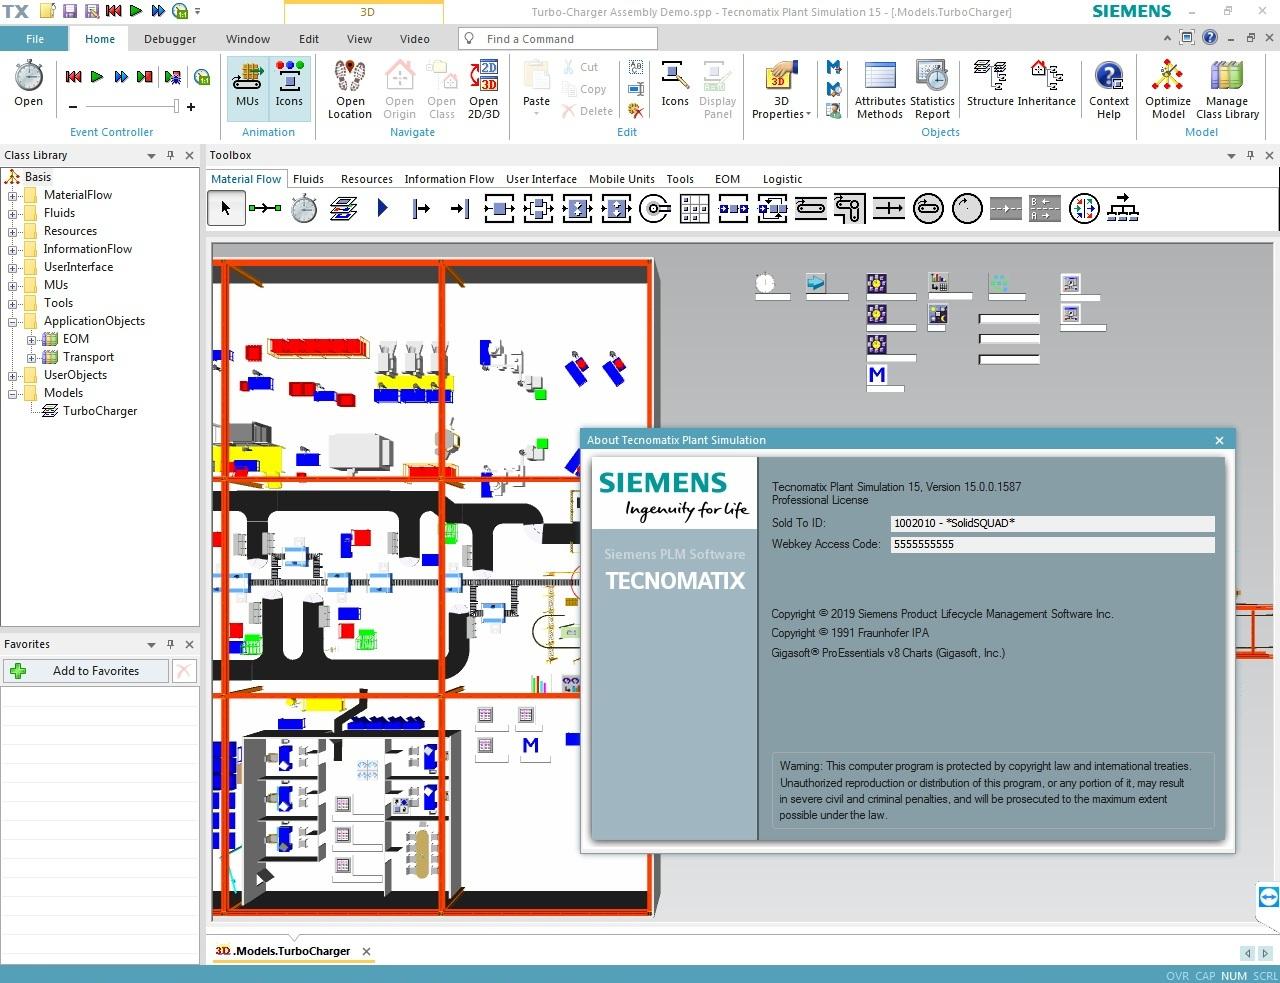 Working with Siemens Tecnomatix Plant Simulation 15.0 full